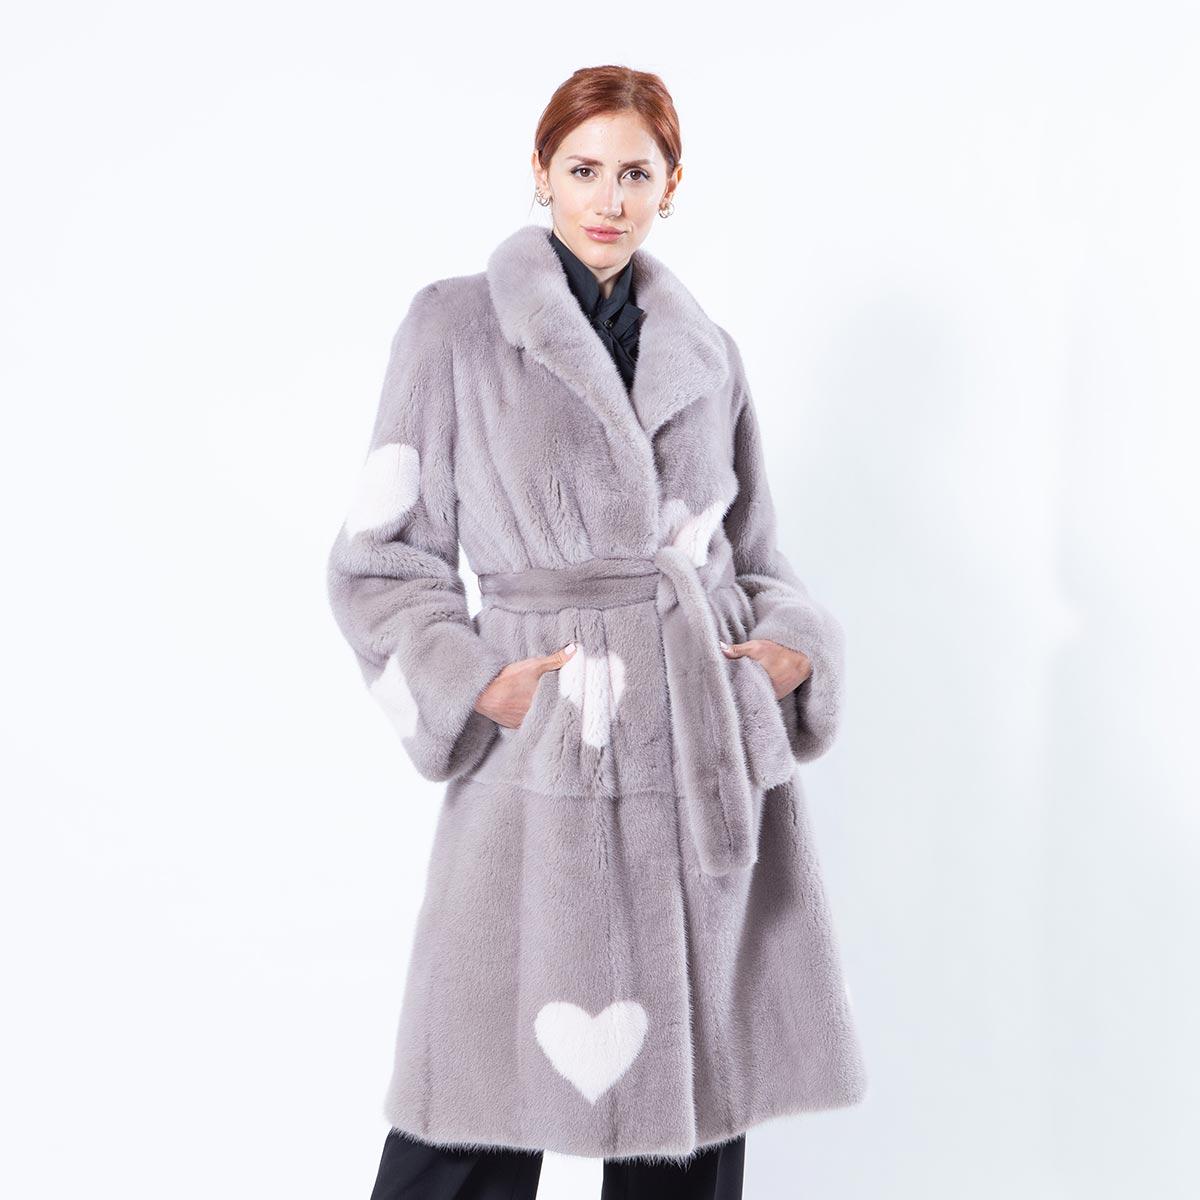 Stucco Mink Coat   Sarigianni Furs